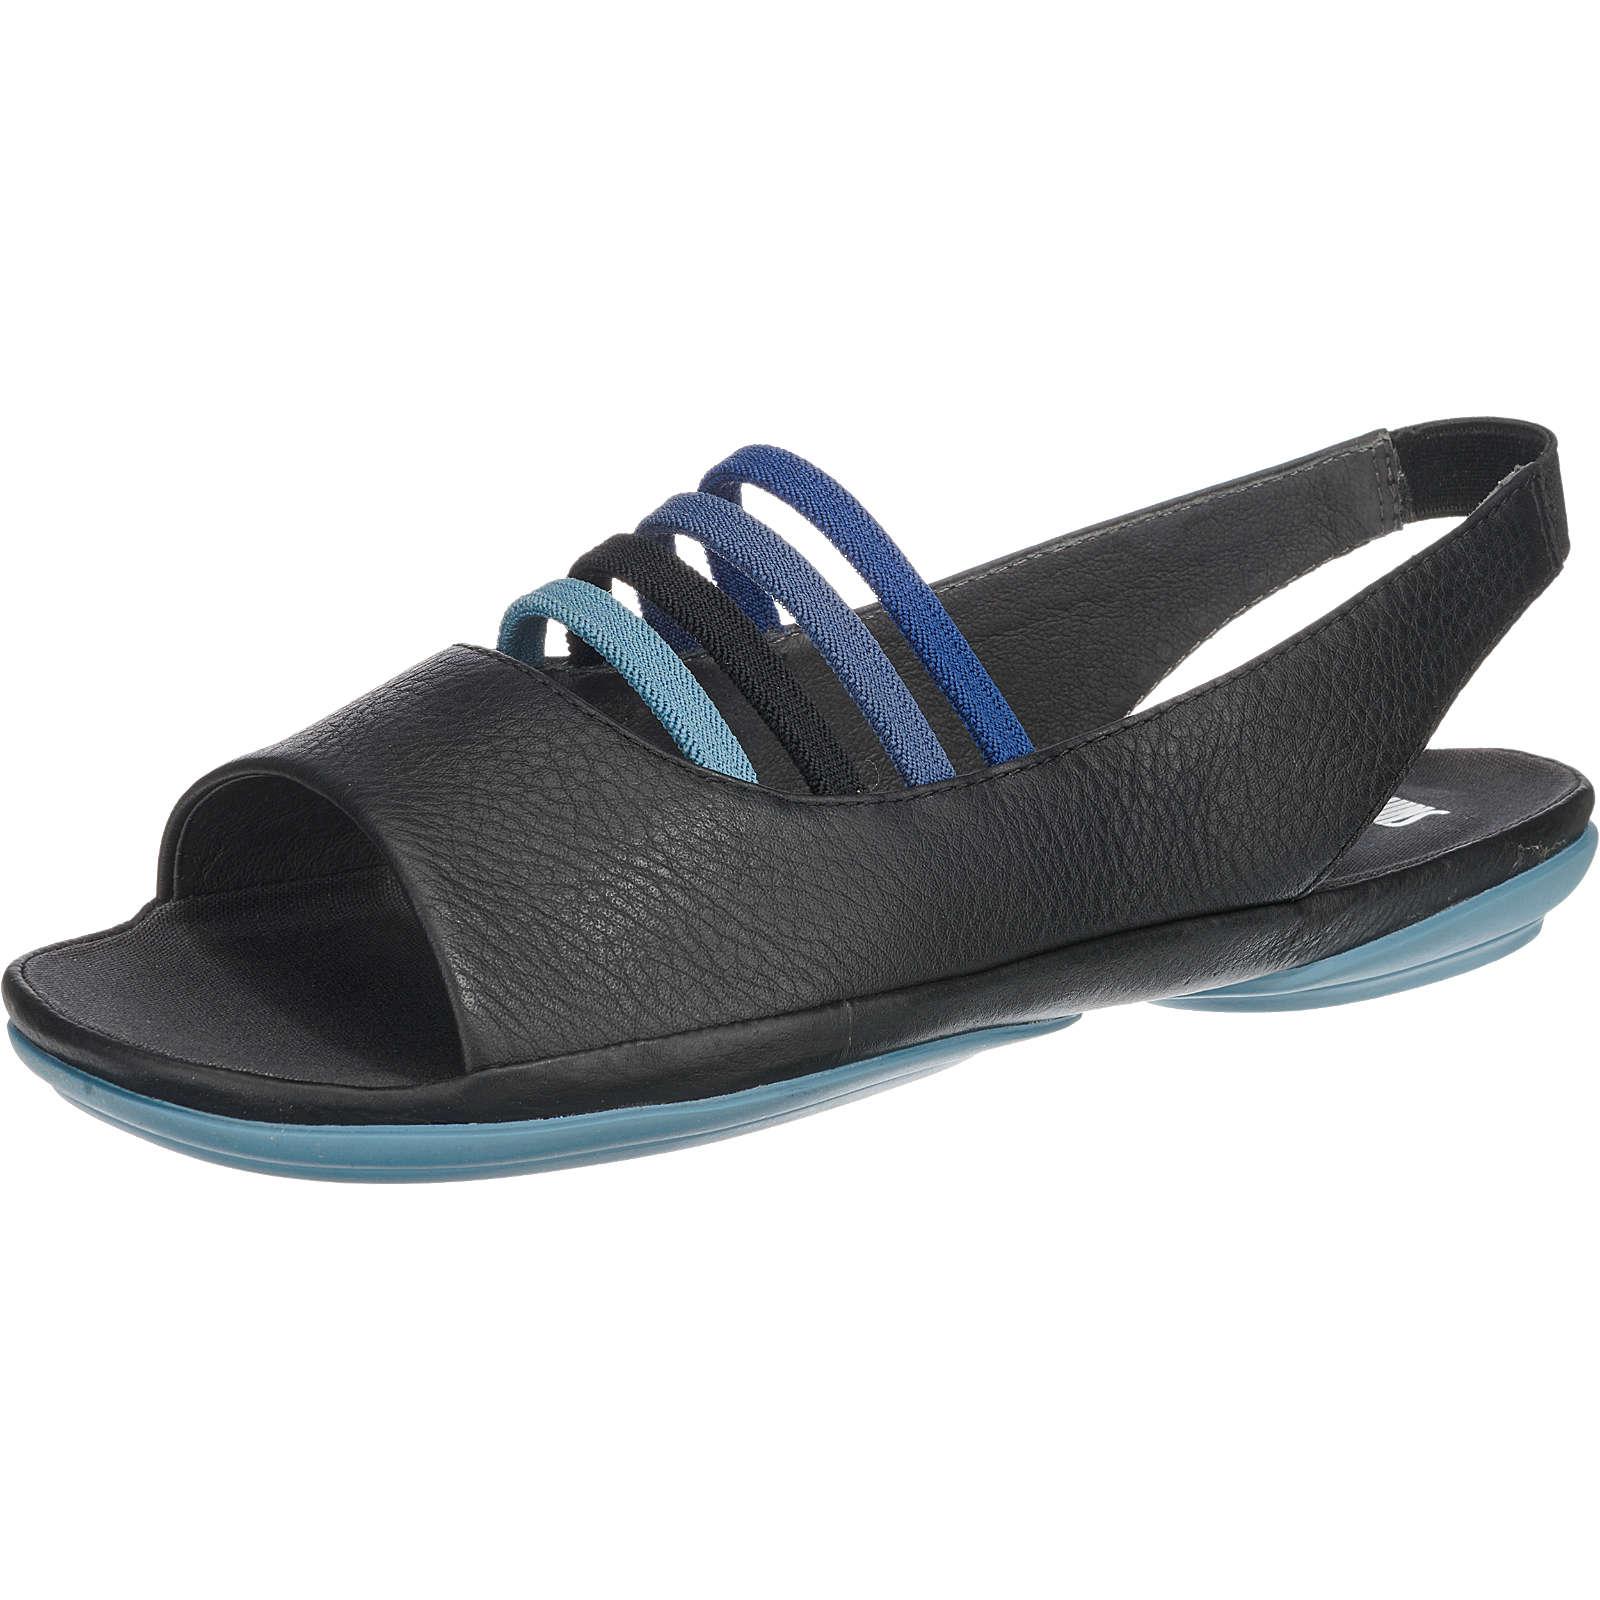 CAMPER Twins Sandaletten schwarz Damen Gr. 39